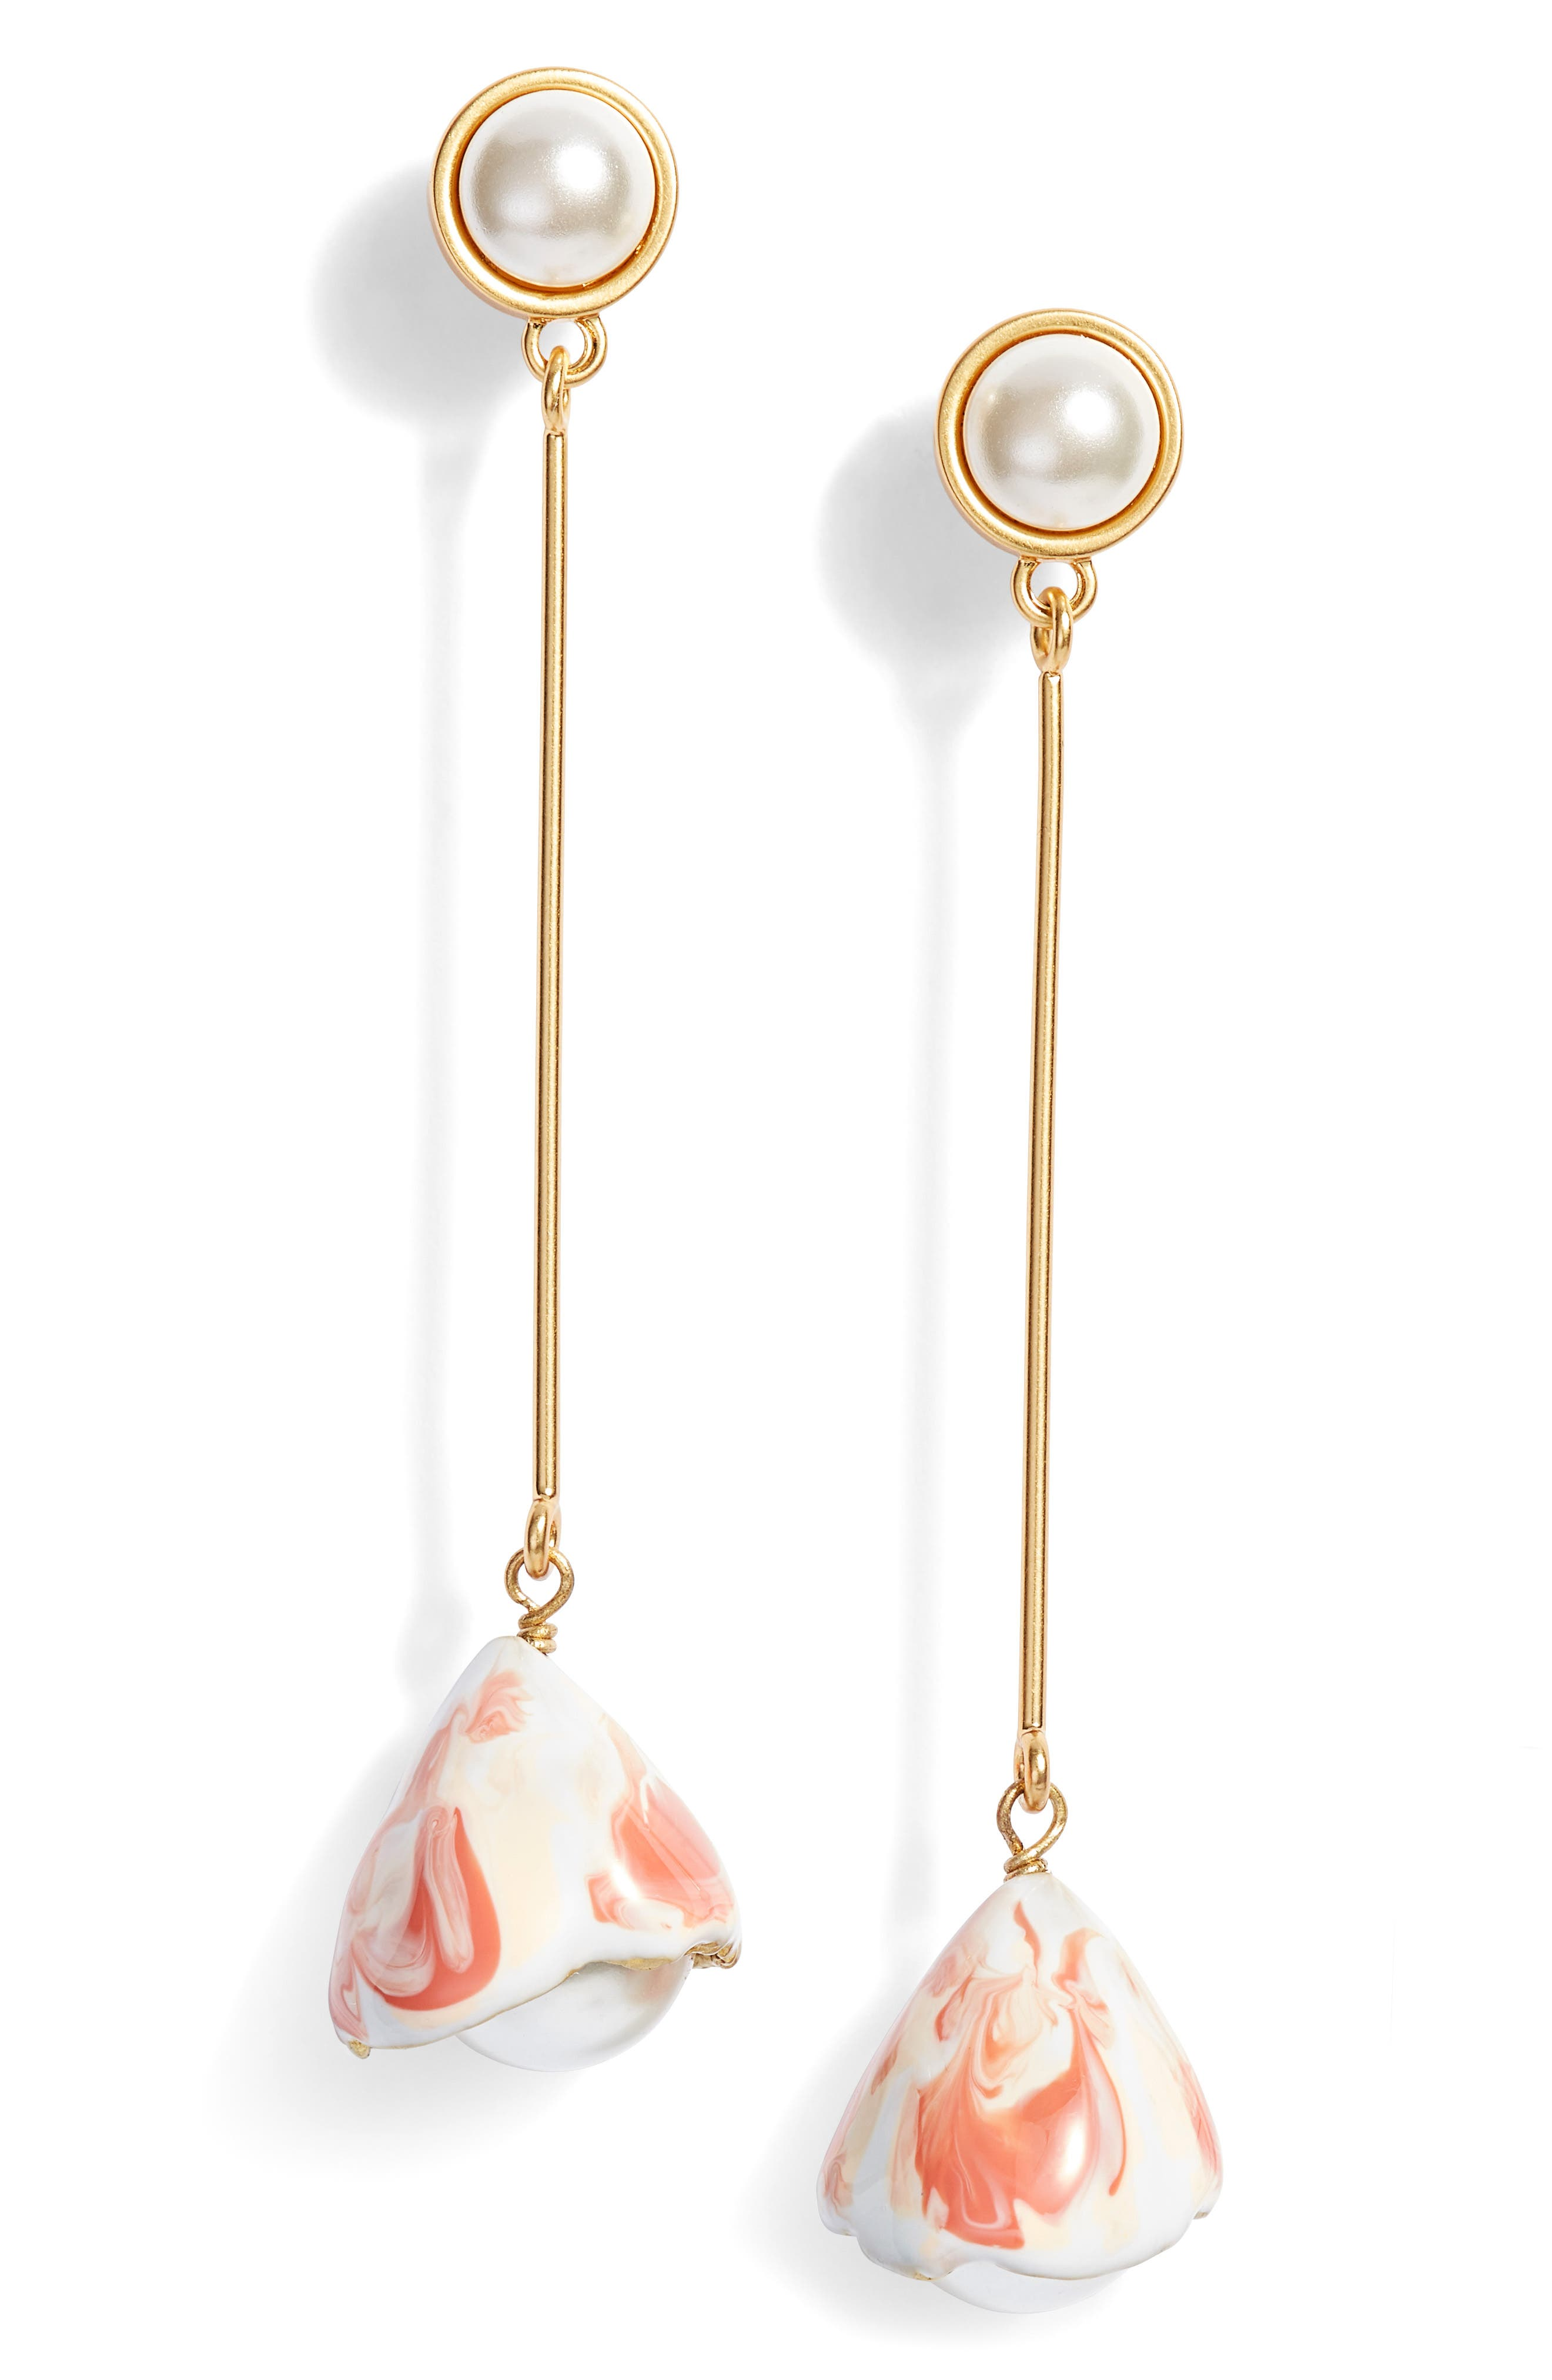 Tory Burch Imitation Pearl Flowerbud Linear Earrings